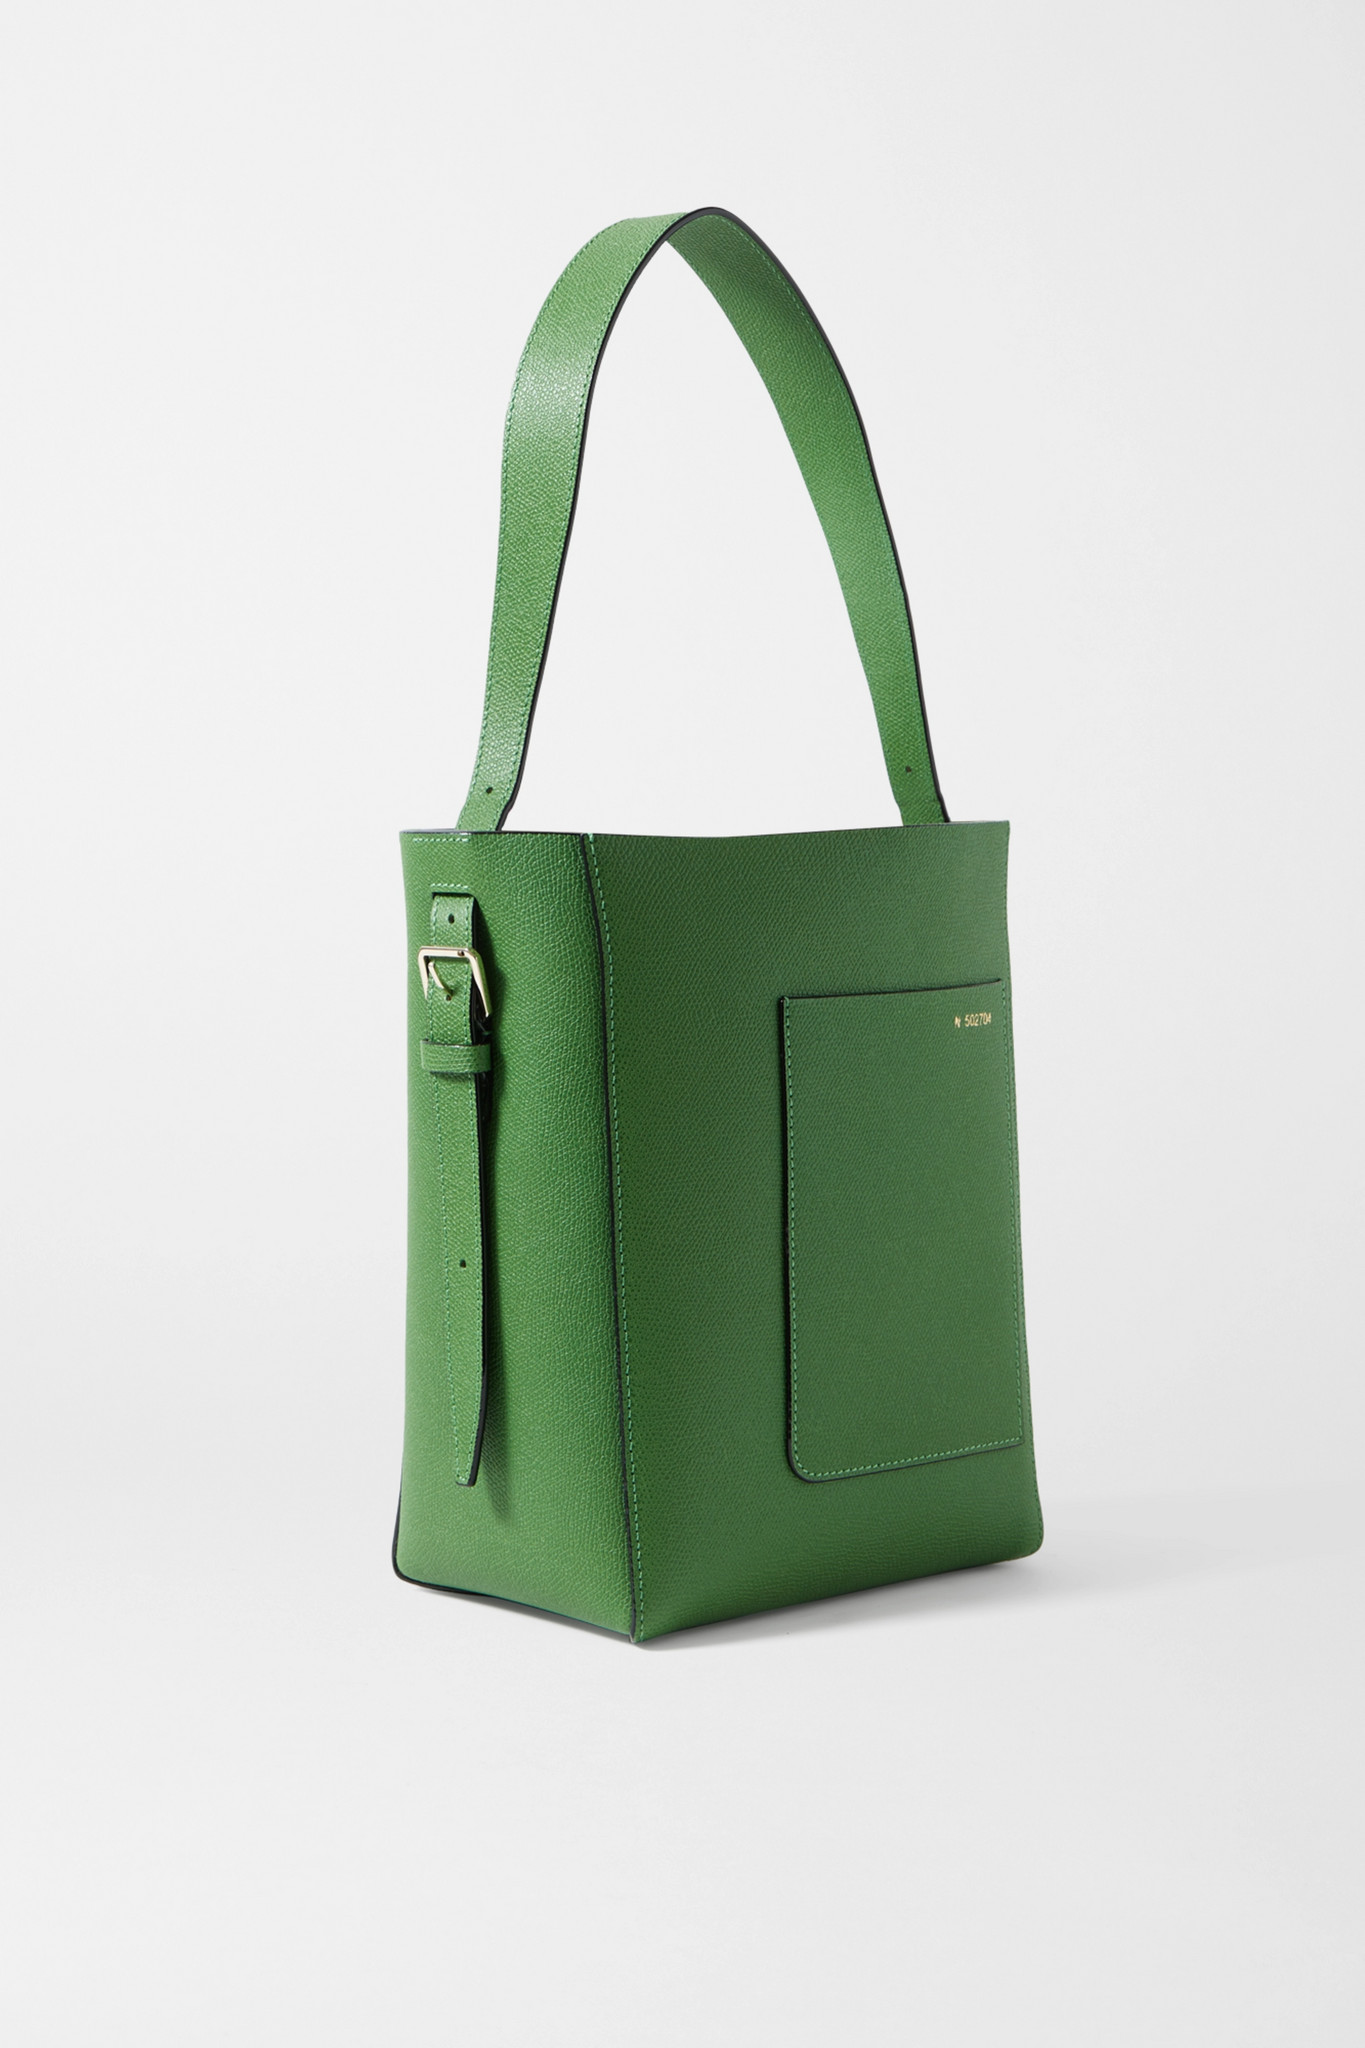 VALEXTRA - Secchiello 纹理皮革小号手提包 - 绿色 - one size